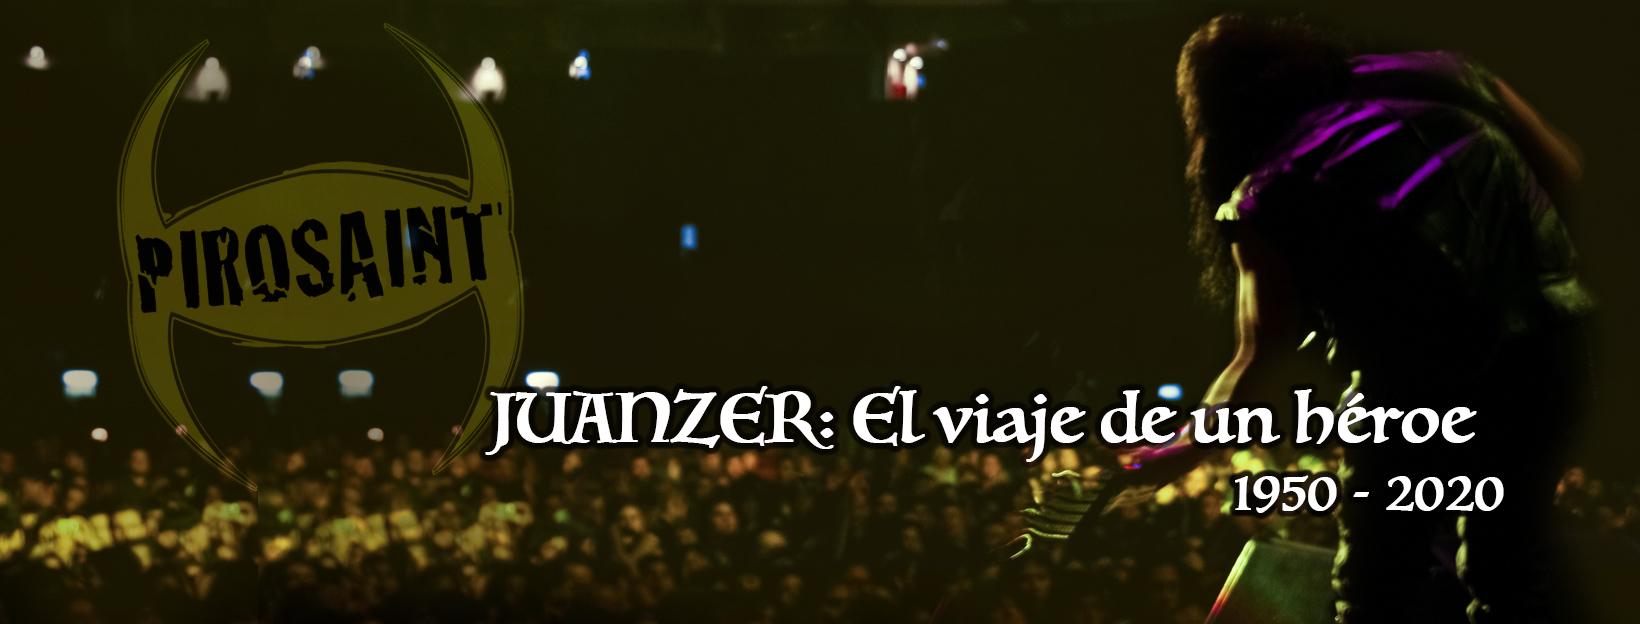 Pirosaint presenta video homenaje a Juan Álvarez de Panzer